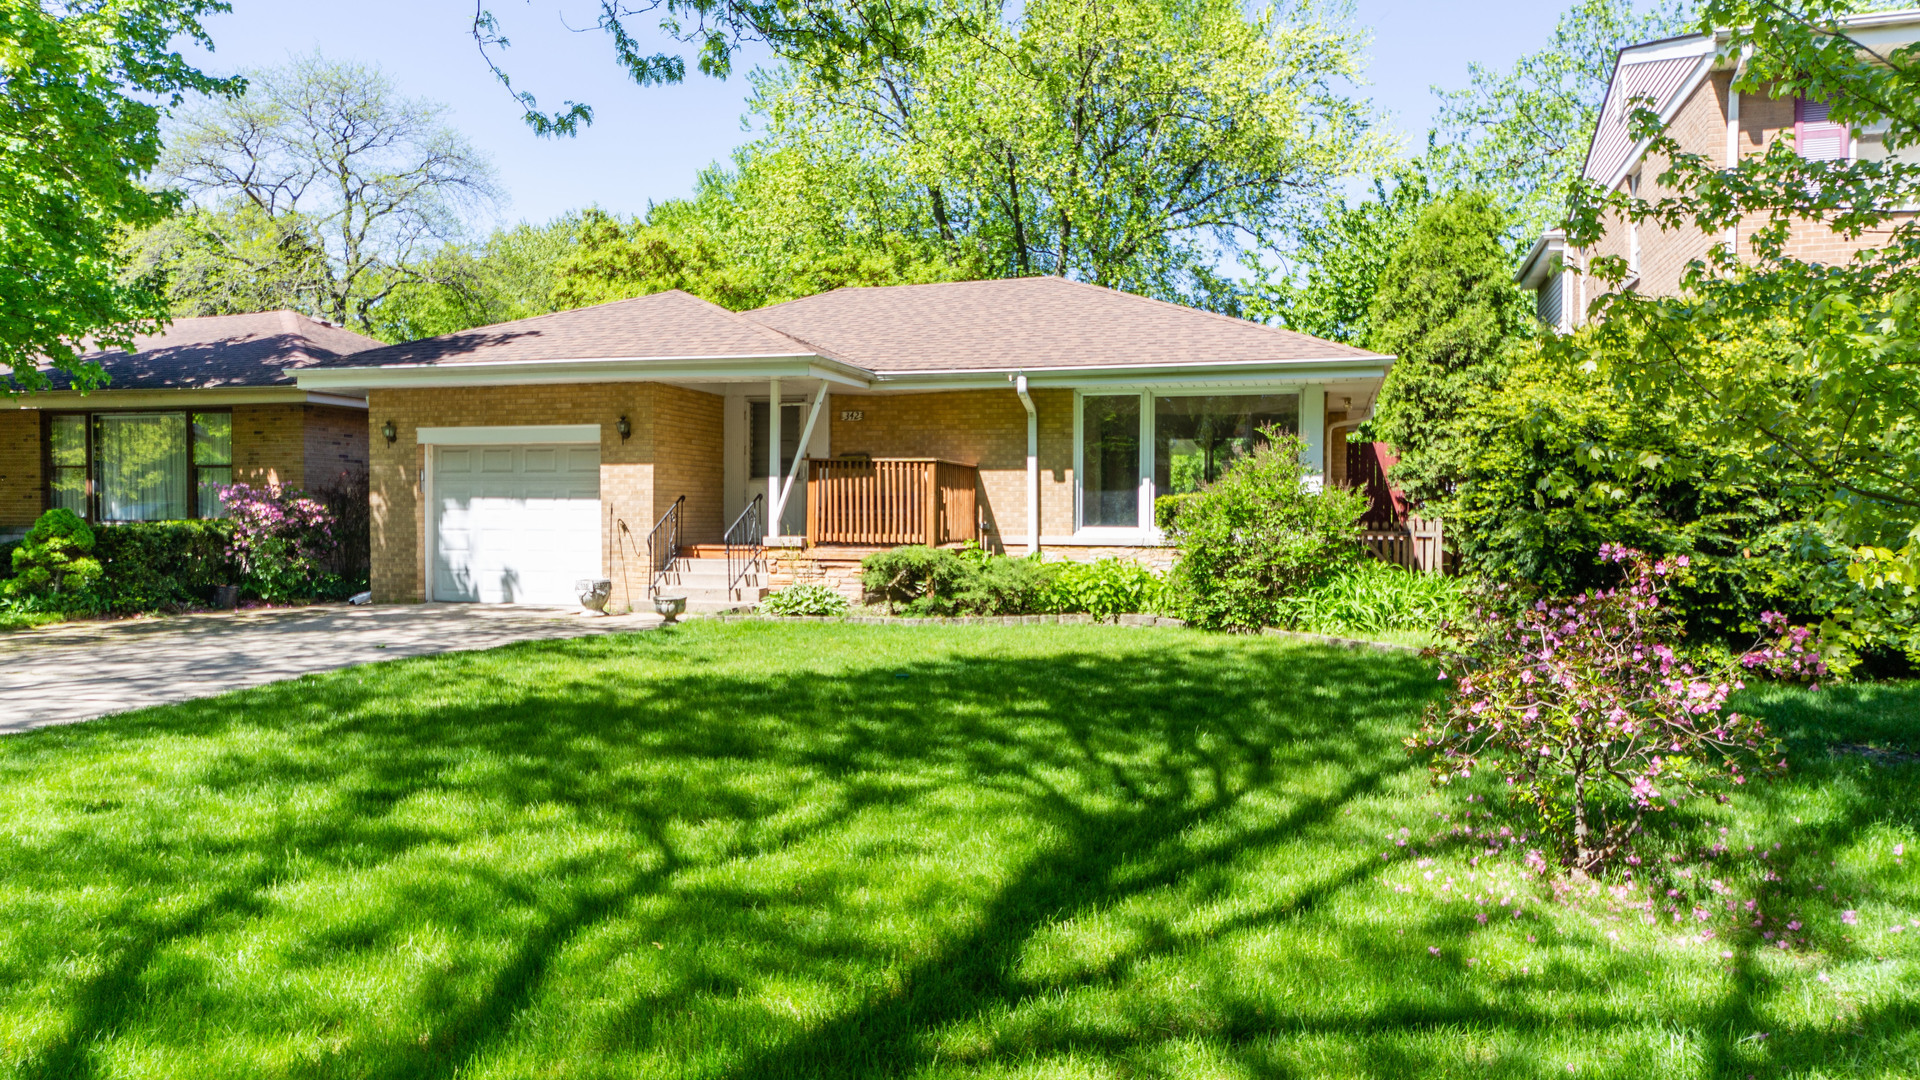 342 ASHLAND, EVANSTON, Illinois, 60202